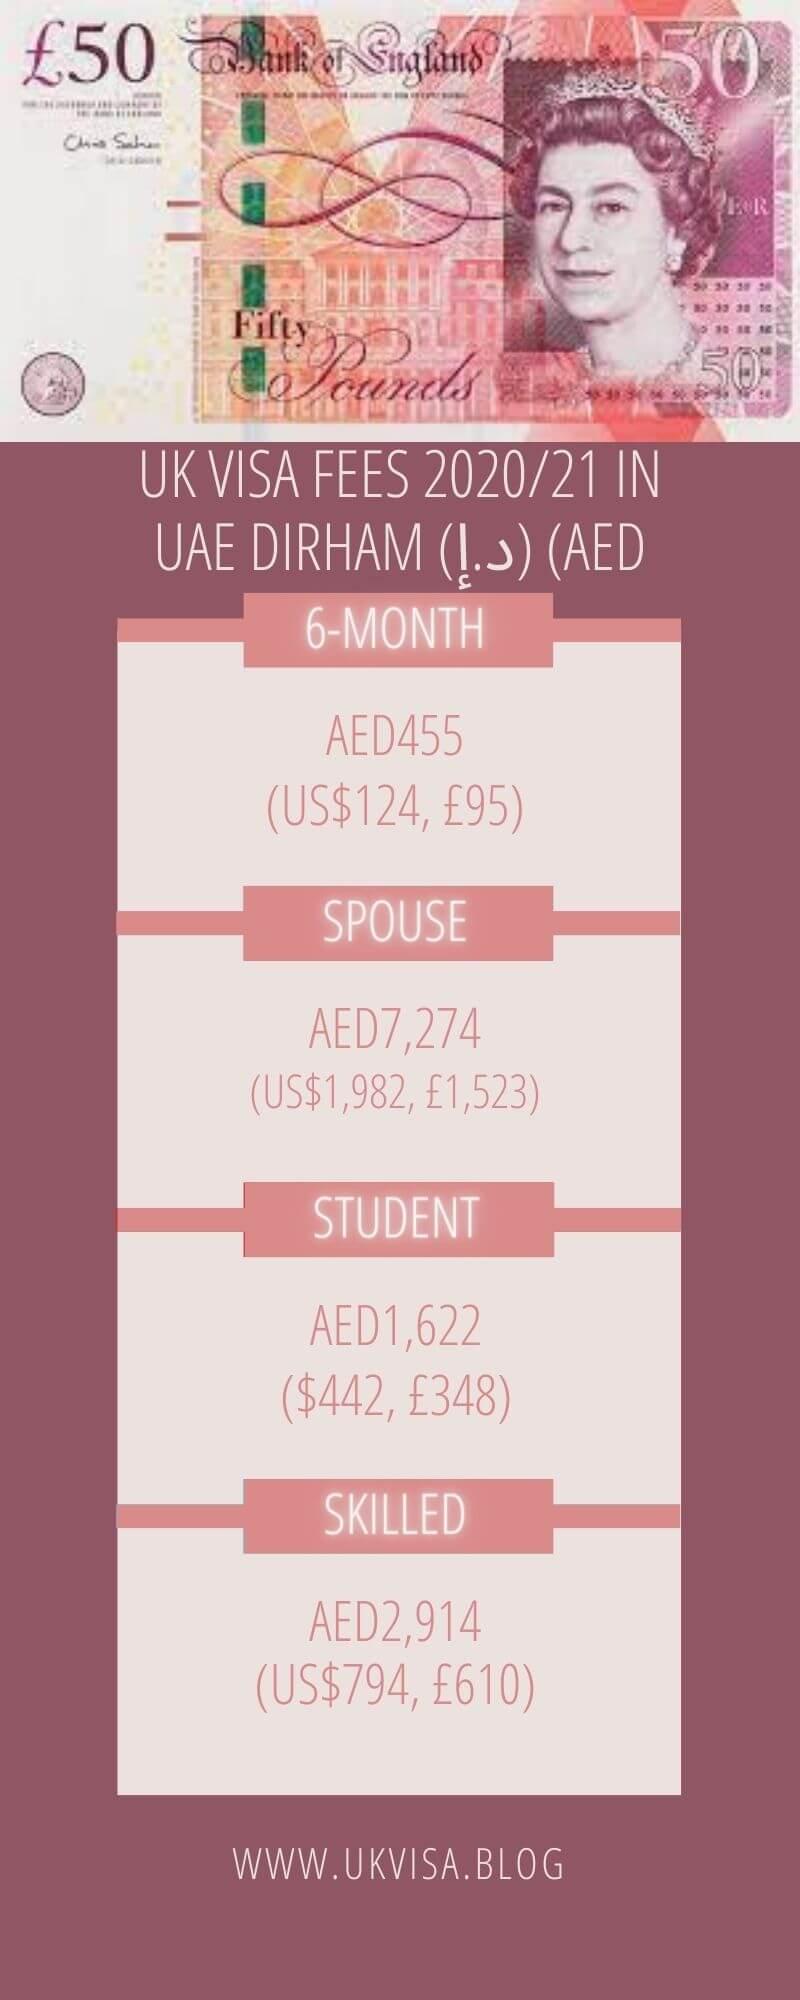 UK 6 Month Visit, Tourist, Student, Spouse Visa Fees Dubai, UAE 2020/21